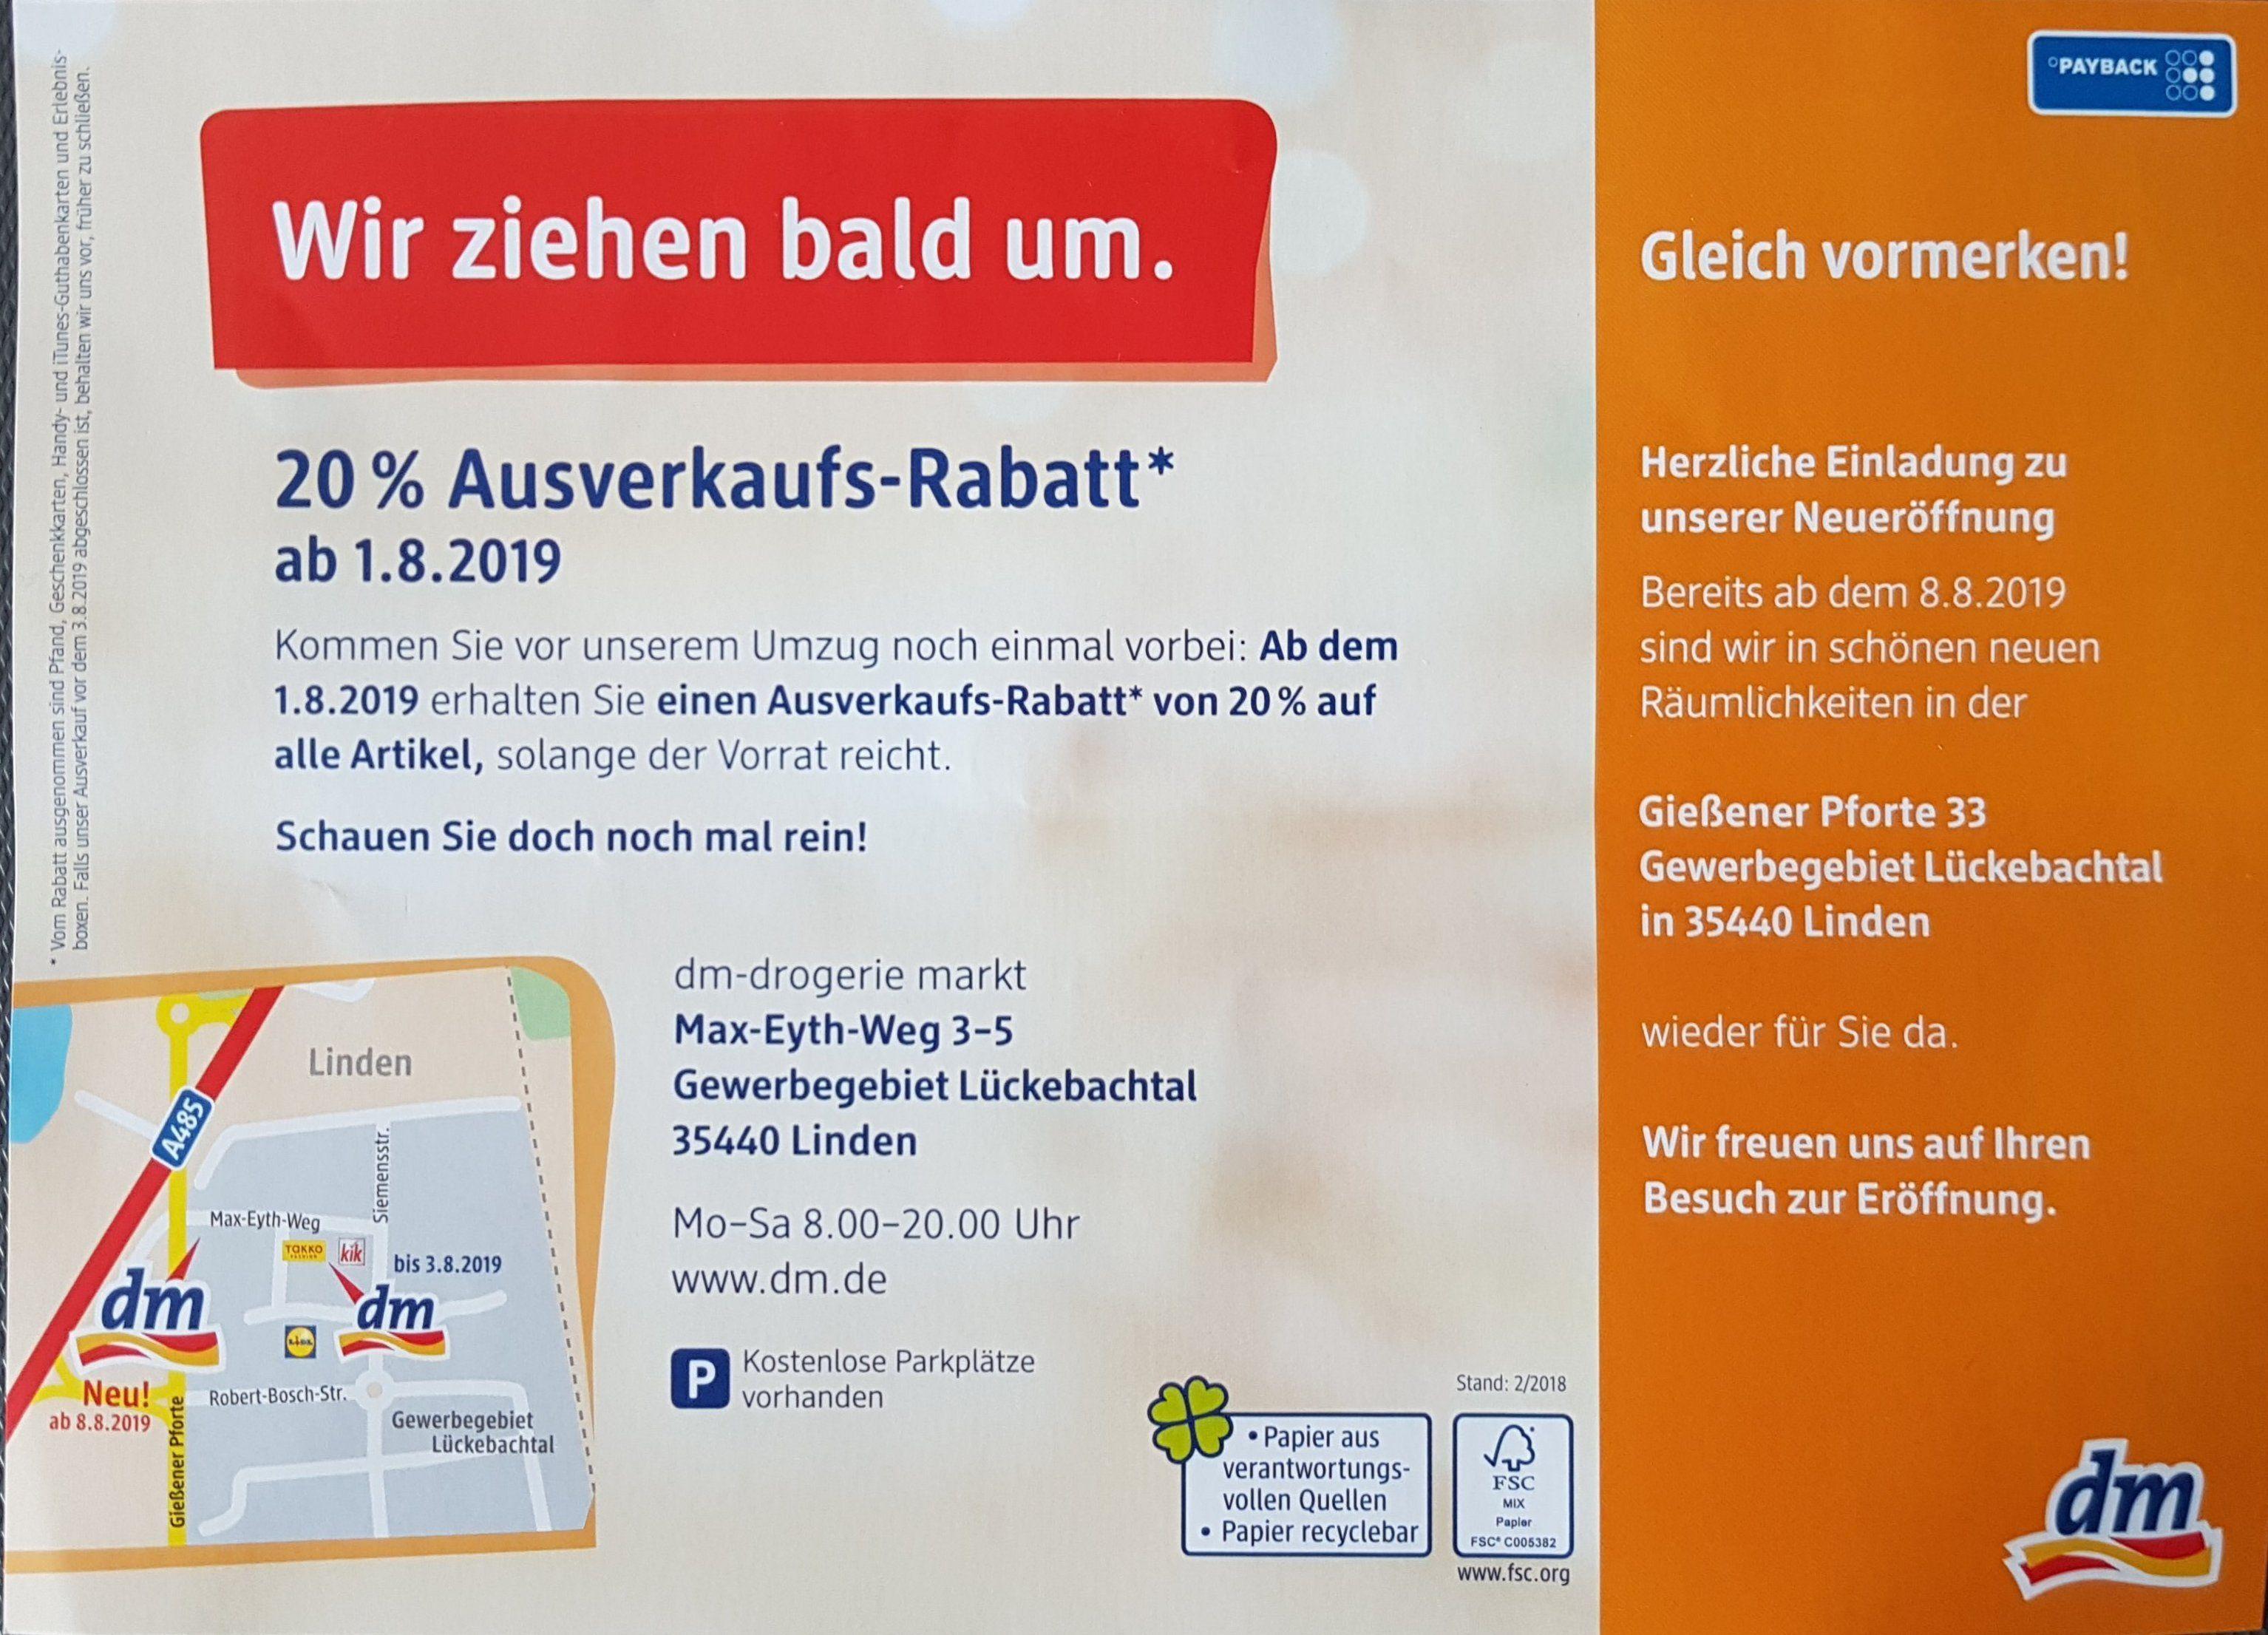 Lokal Linden (Landkreis Gießen) DM-Drogerie Markt 20% Ausverkaufs-Rabatt ab 01.08.